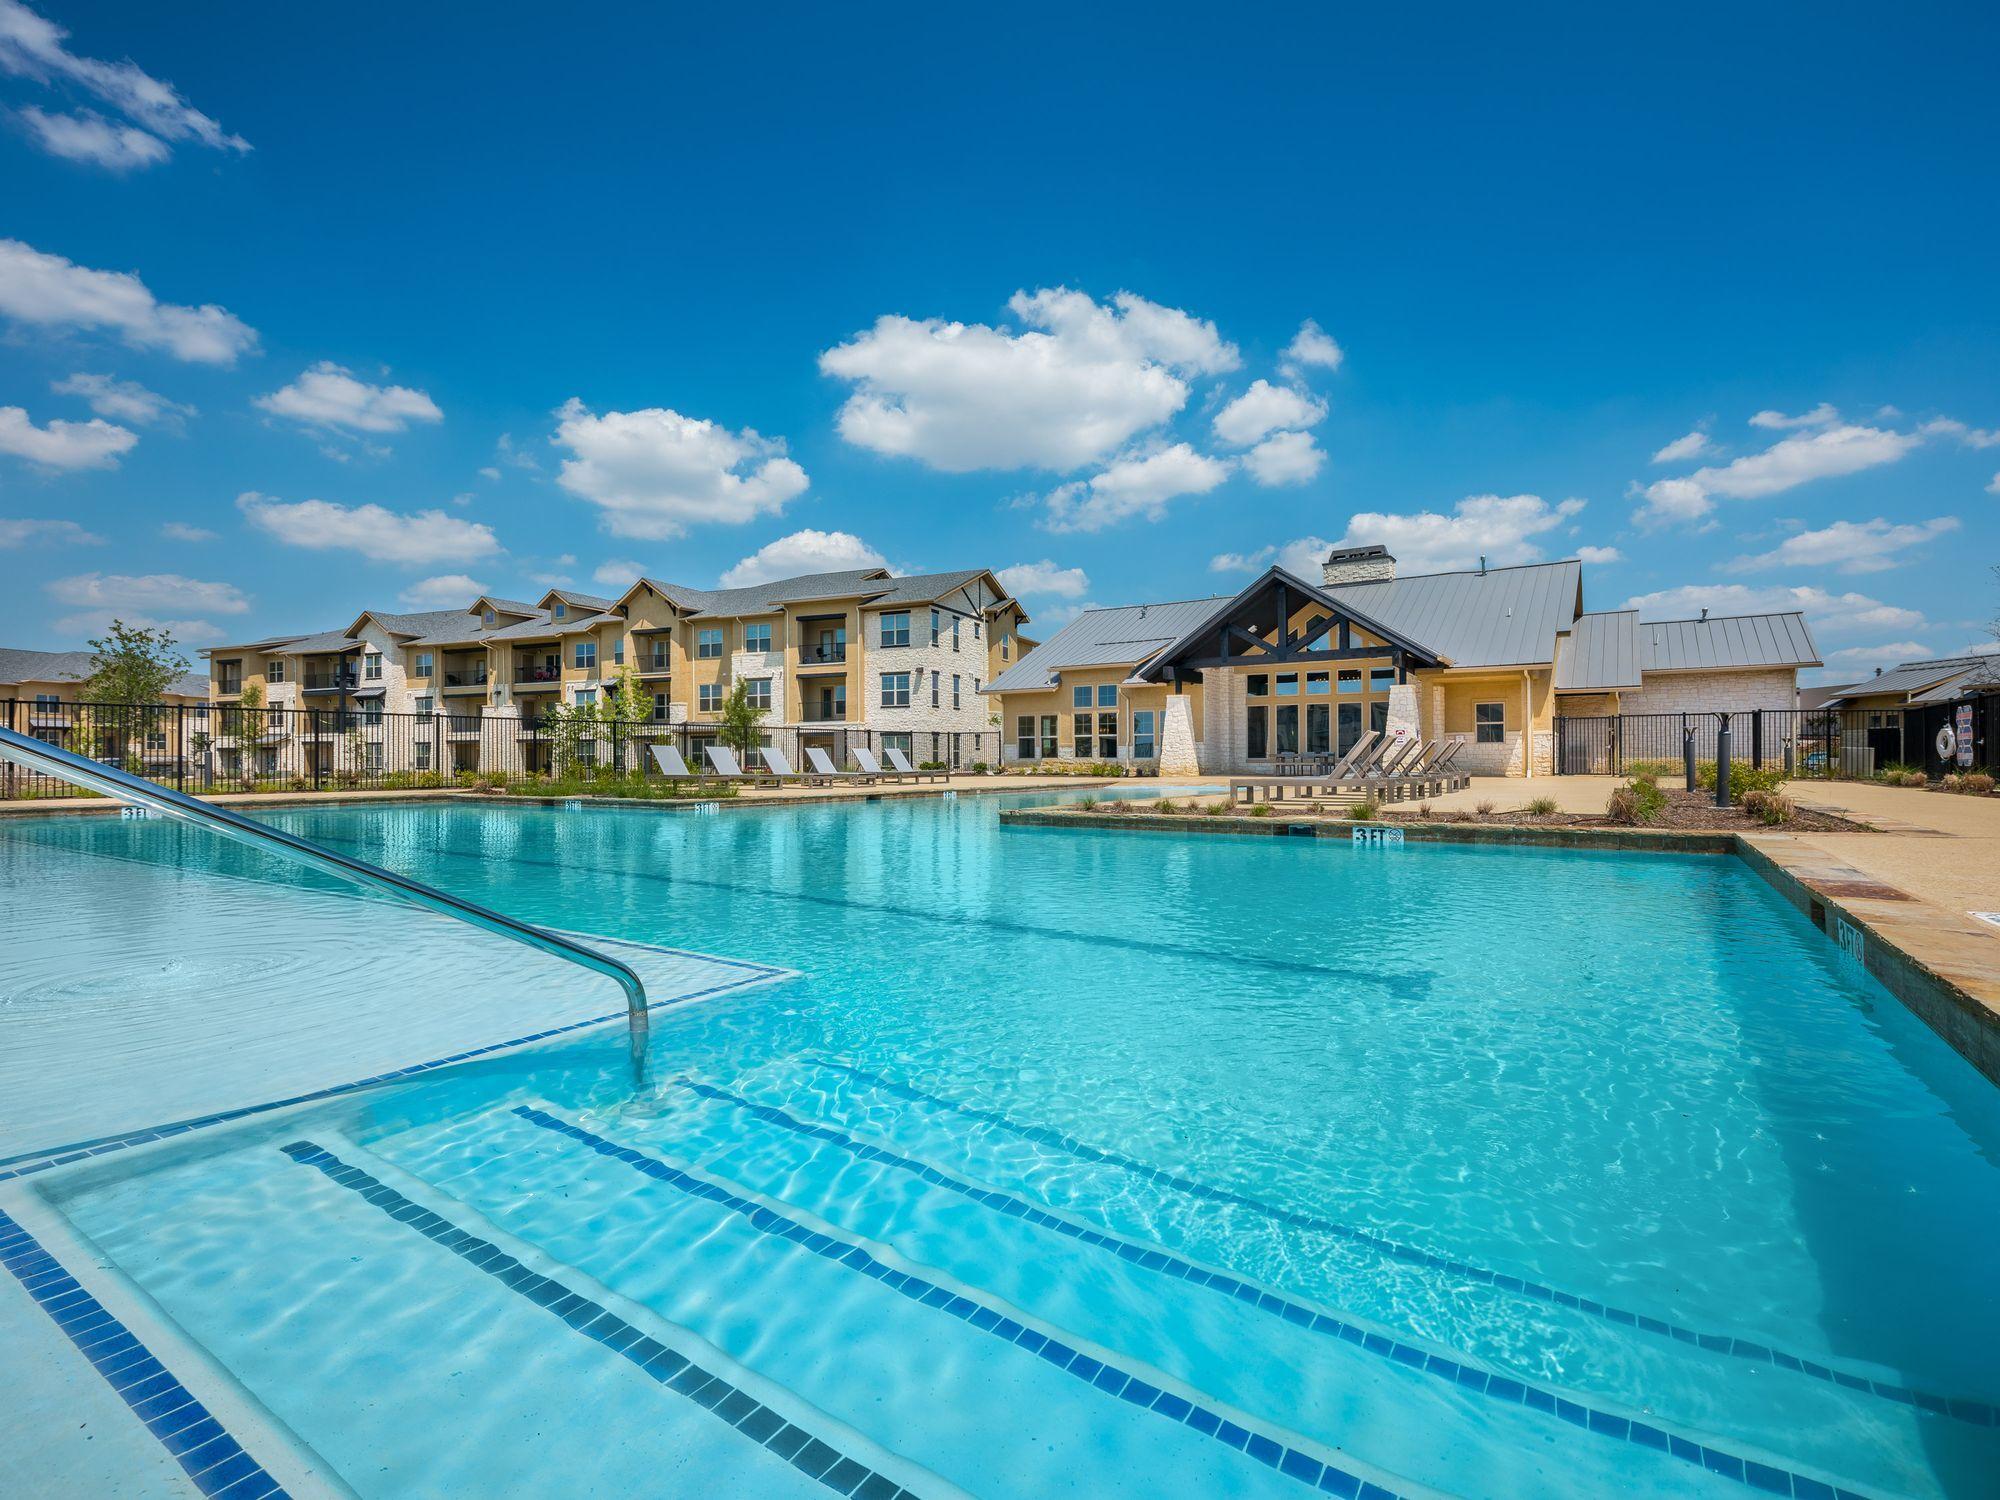 1690 Farm to Market Road 423, Frisco, TX 75033, 3 Bedroom's, 2 Bathroom's, Denton County, Texas, Apartment for Rent